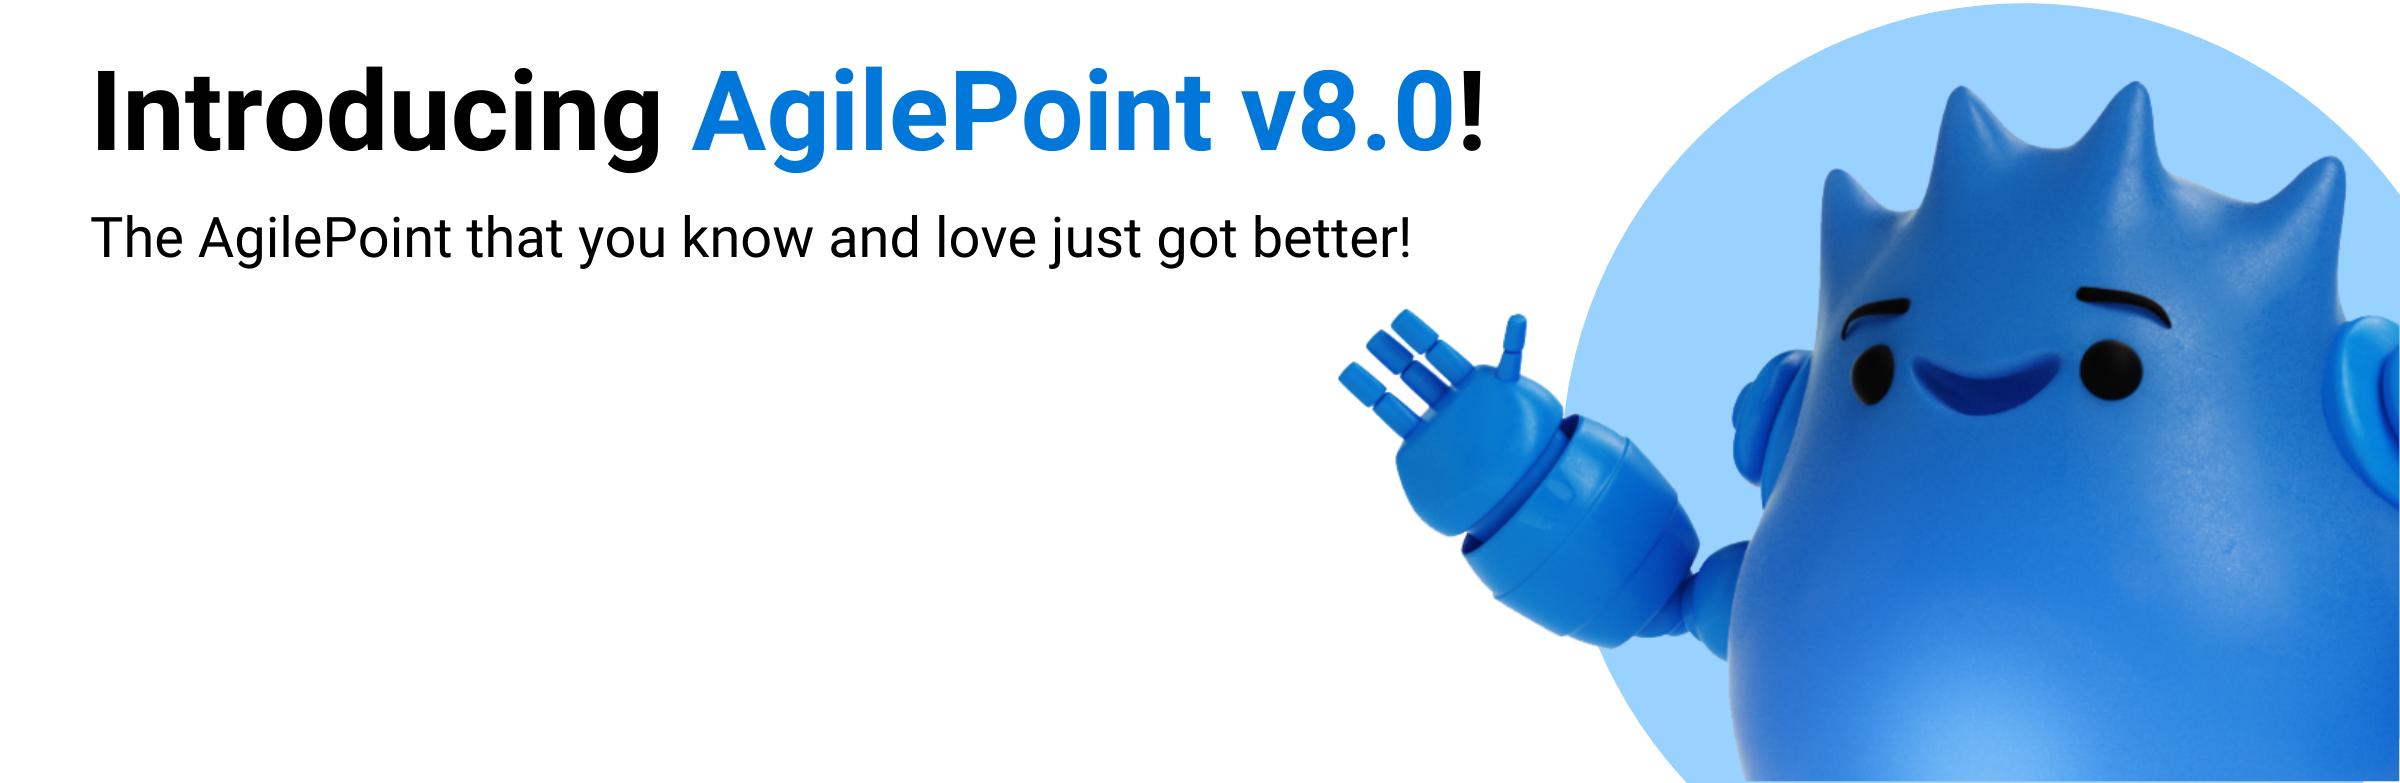 AgilePoint V8 image